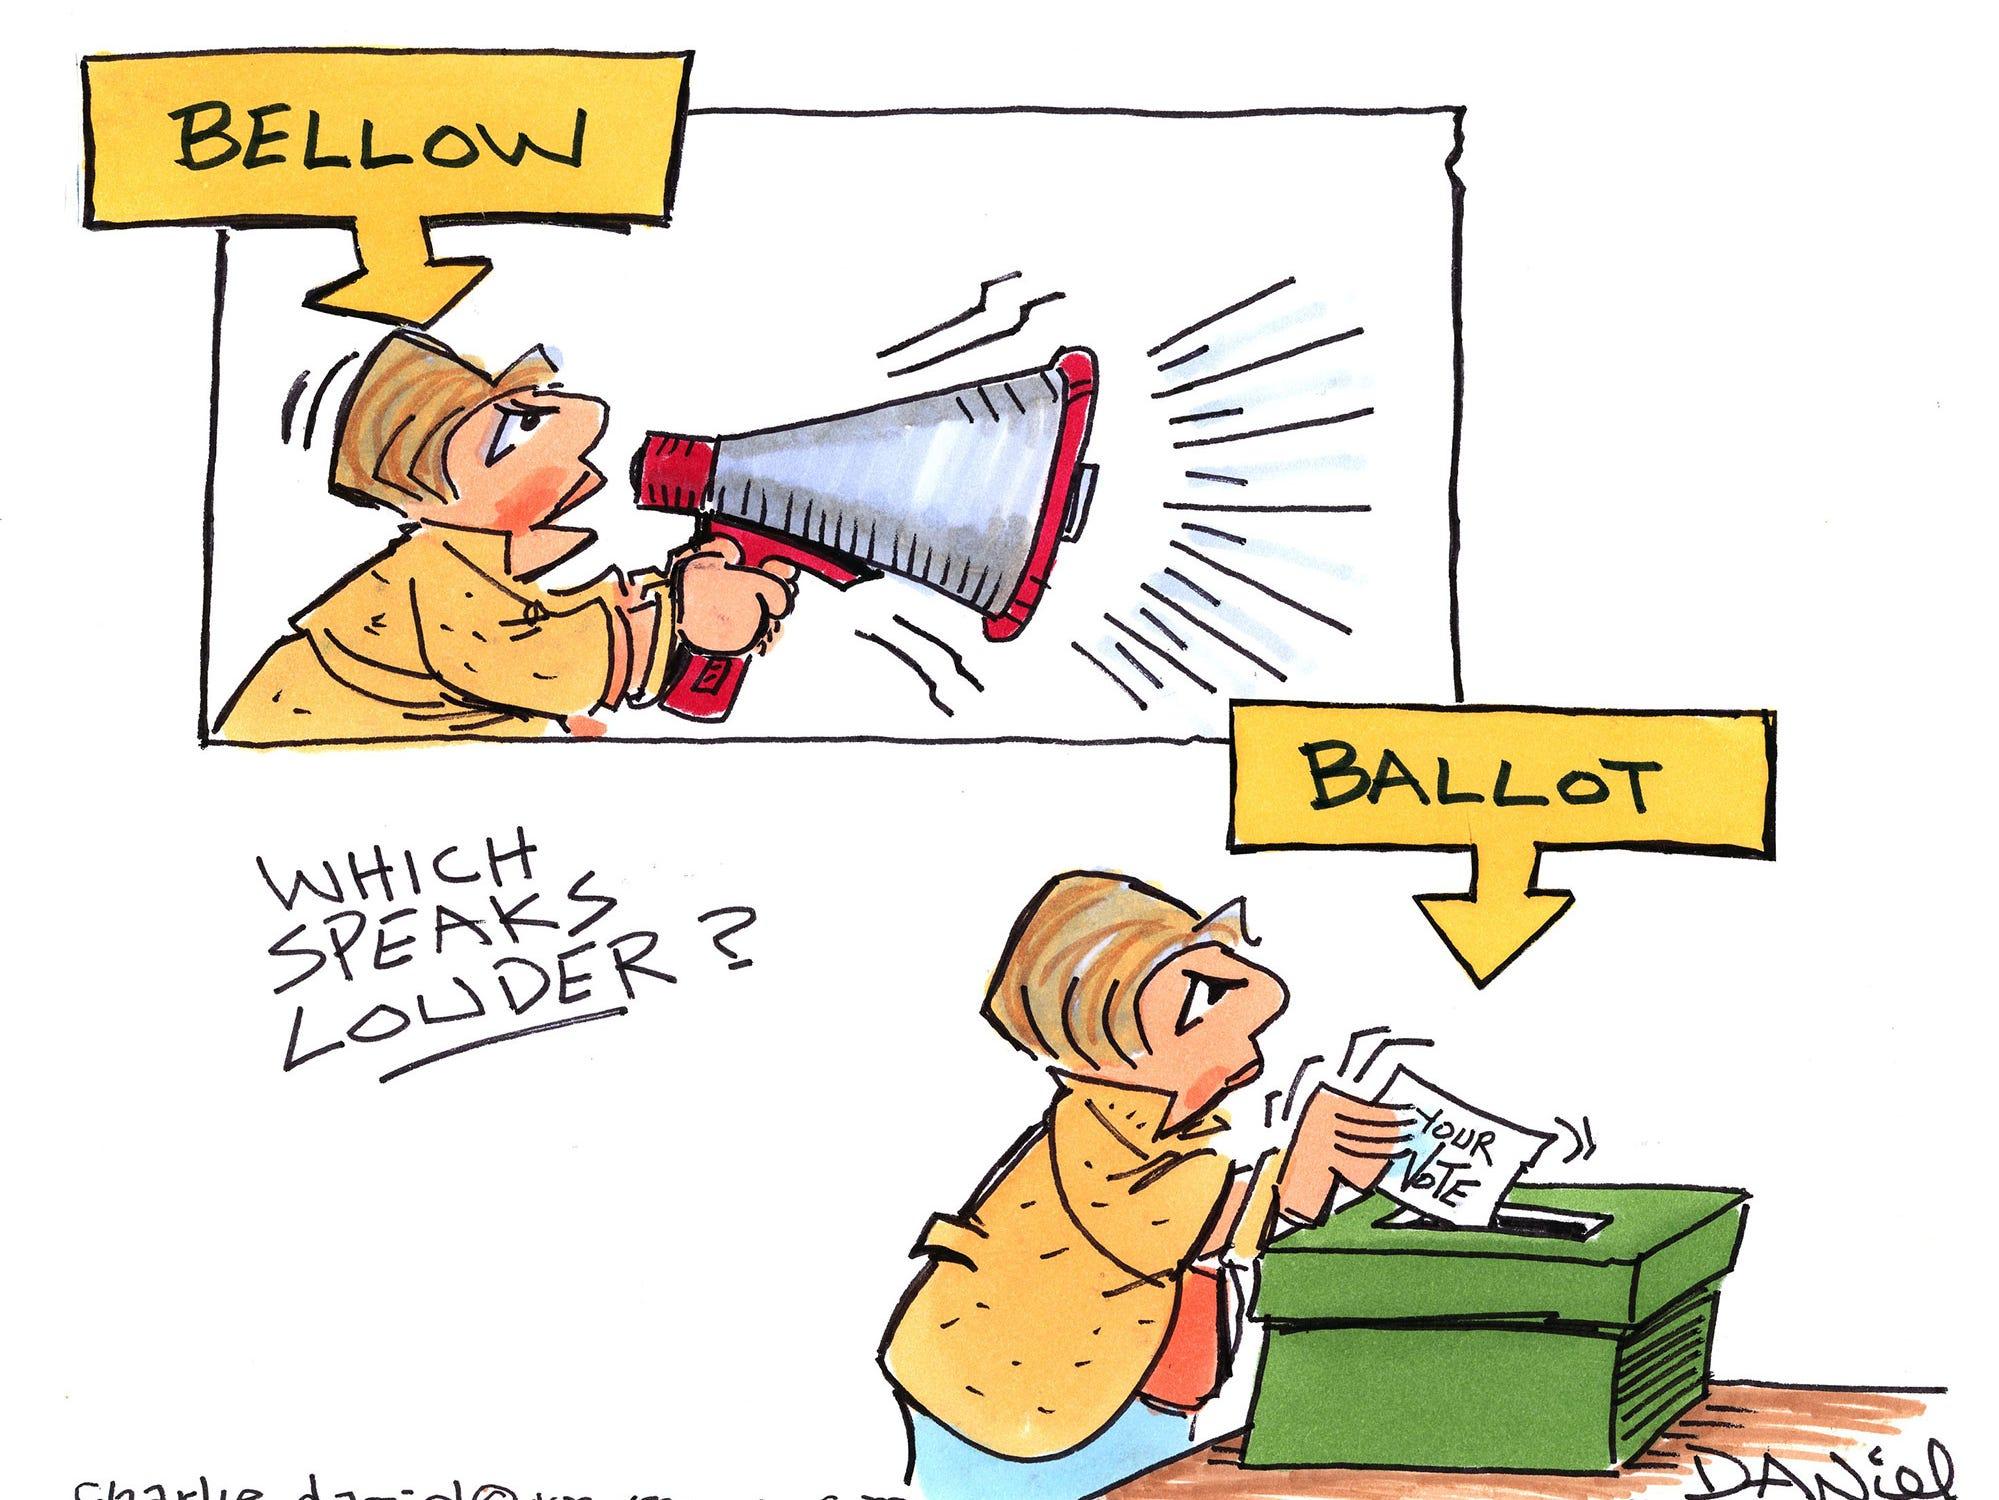 Charlie Daniel editorial cartoon for Thursday, Oct. 11, 2018.